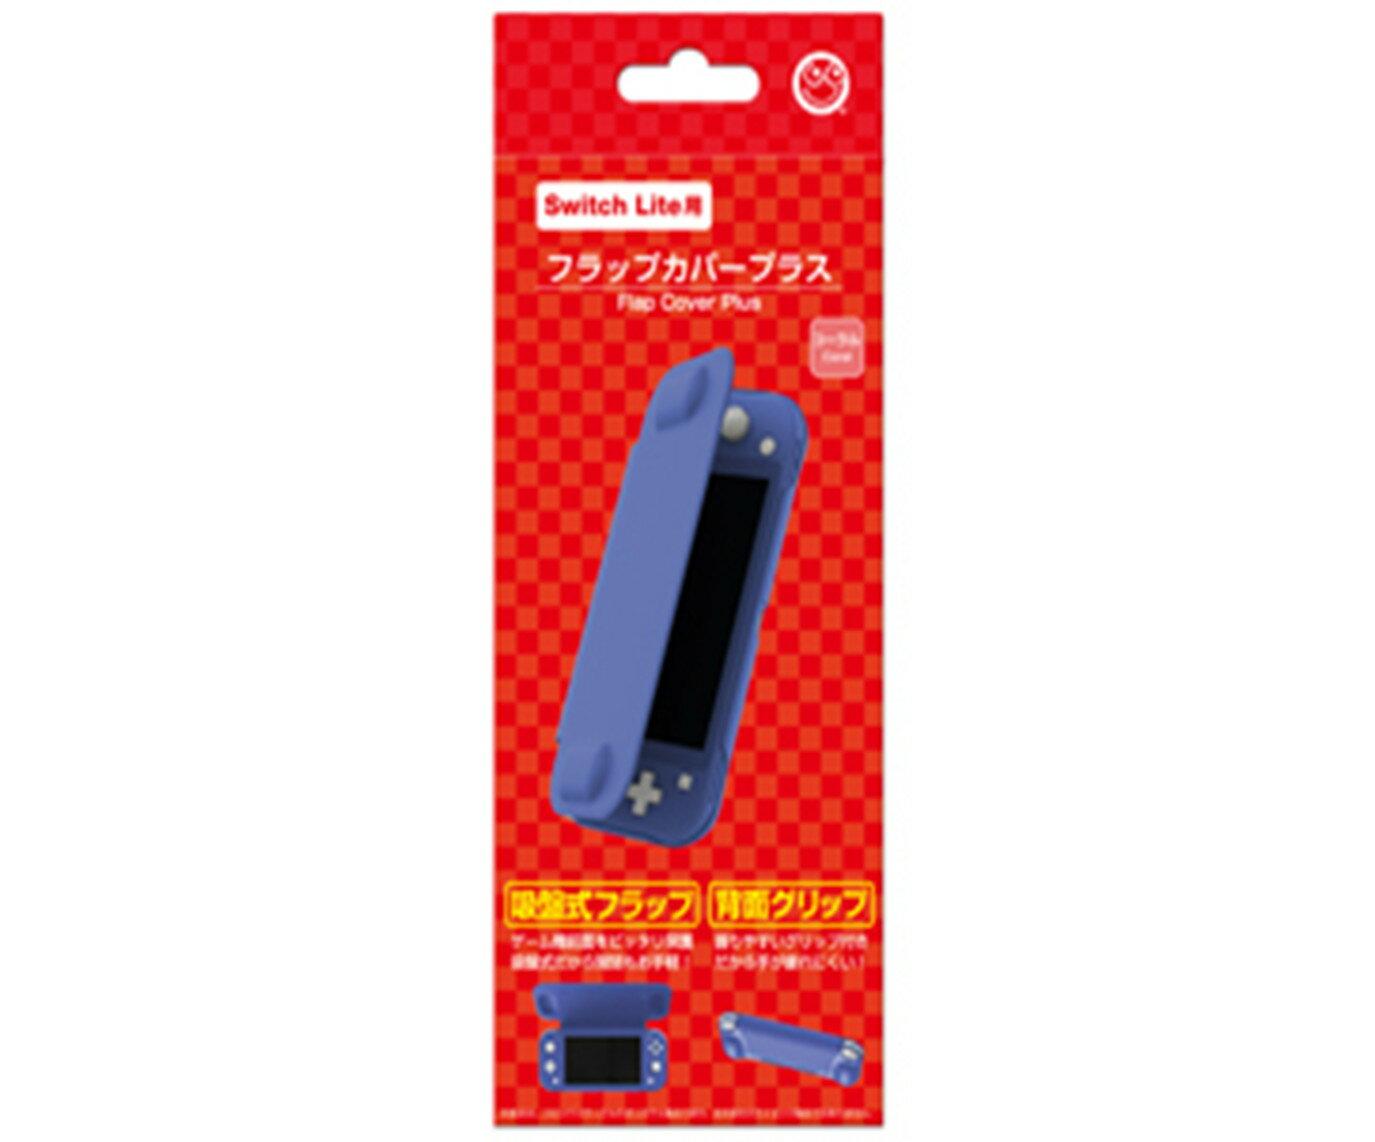 (Switch Lite用) フラップカバープラス (ブルー)